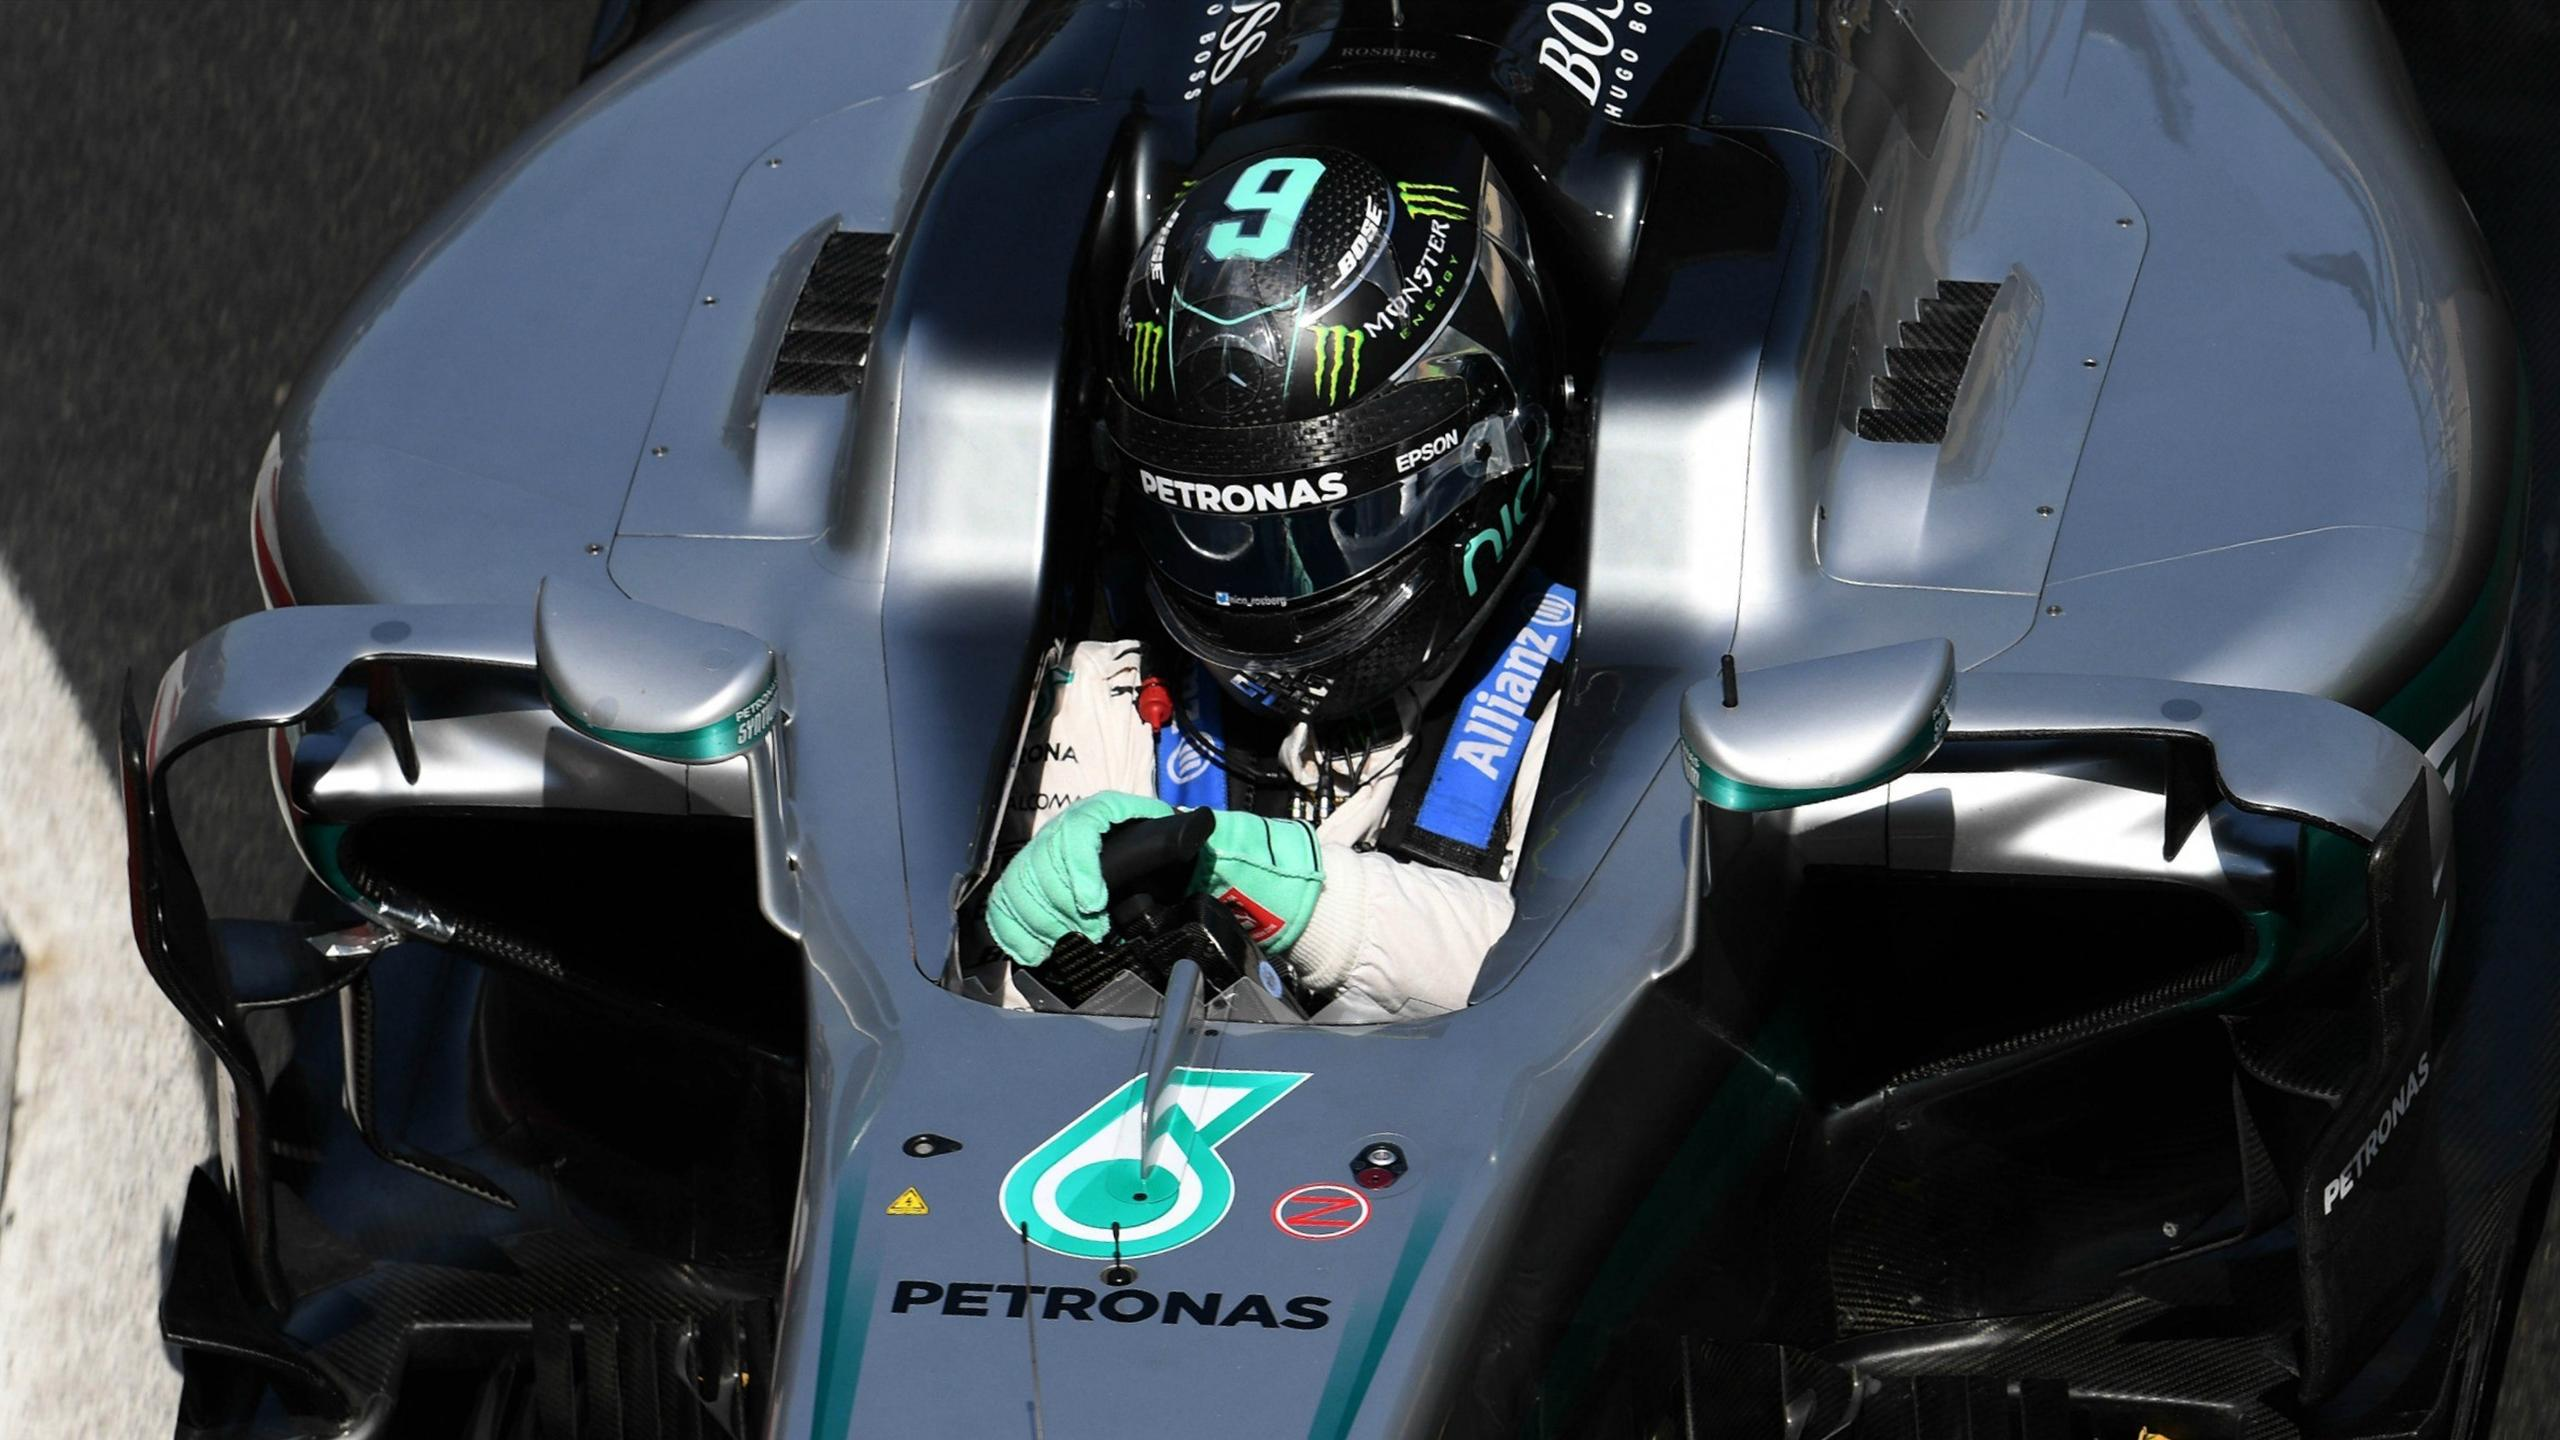 Nico Rosberg (Mercedes) au Grand Prix d'Europe 2016